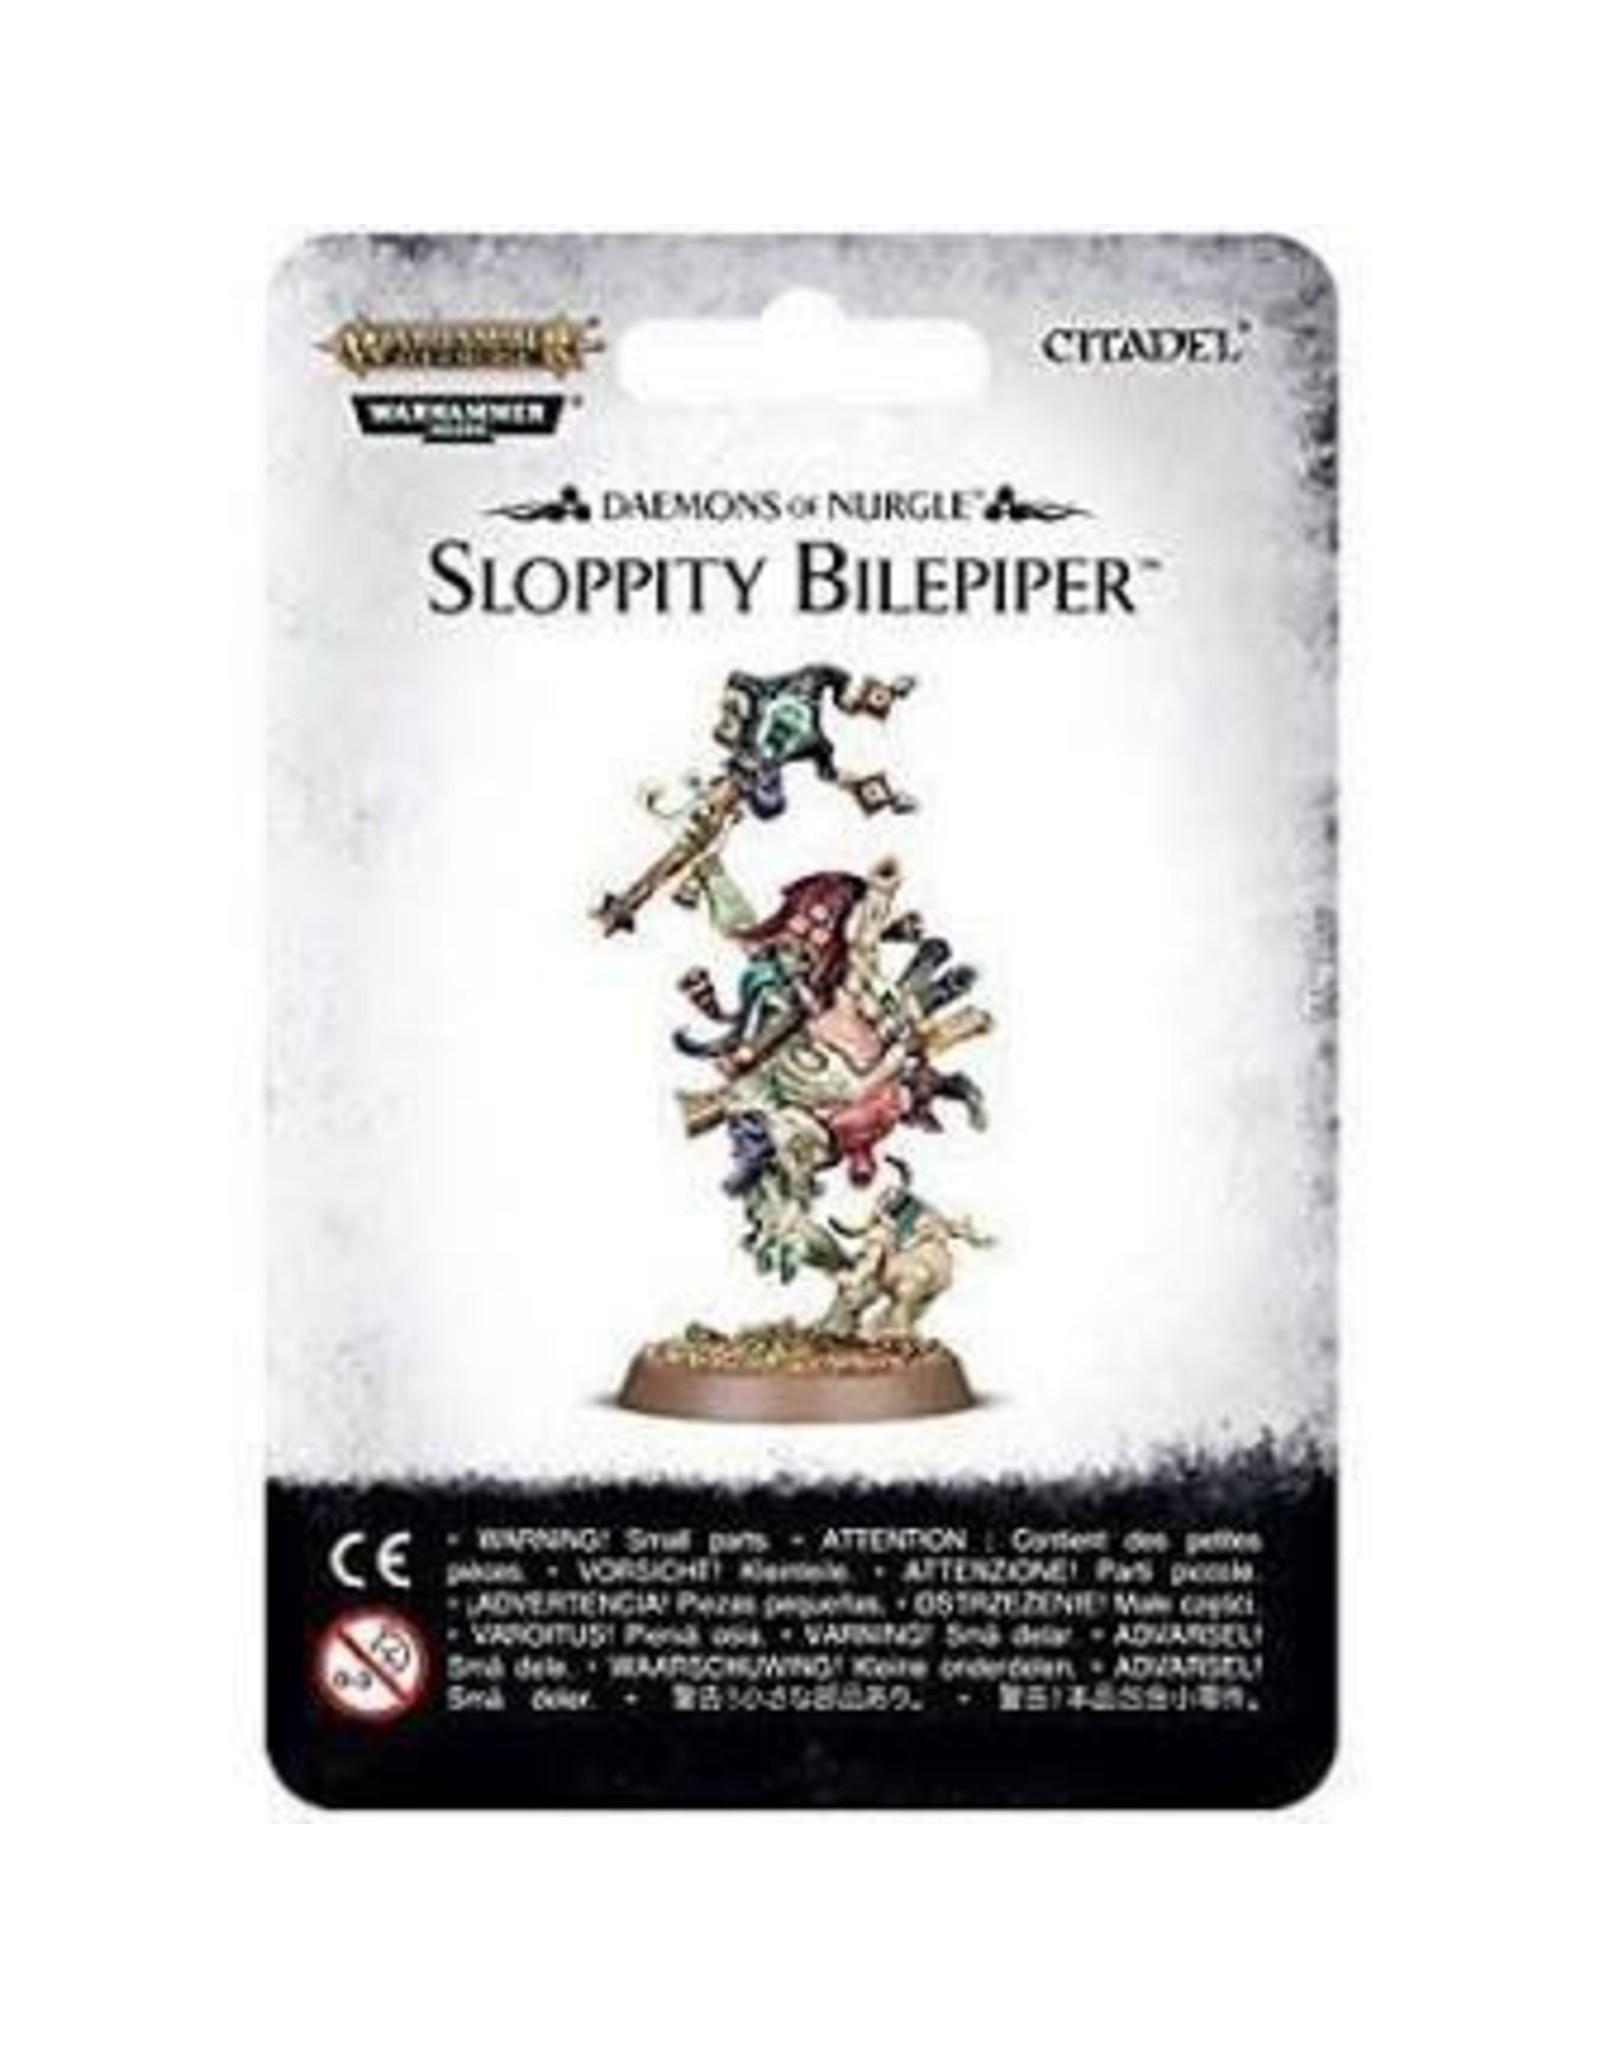 Age of Sigmar Sloppity Bilepiper: Herald of Nurgle